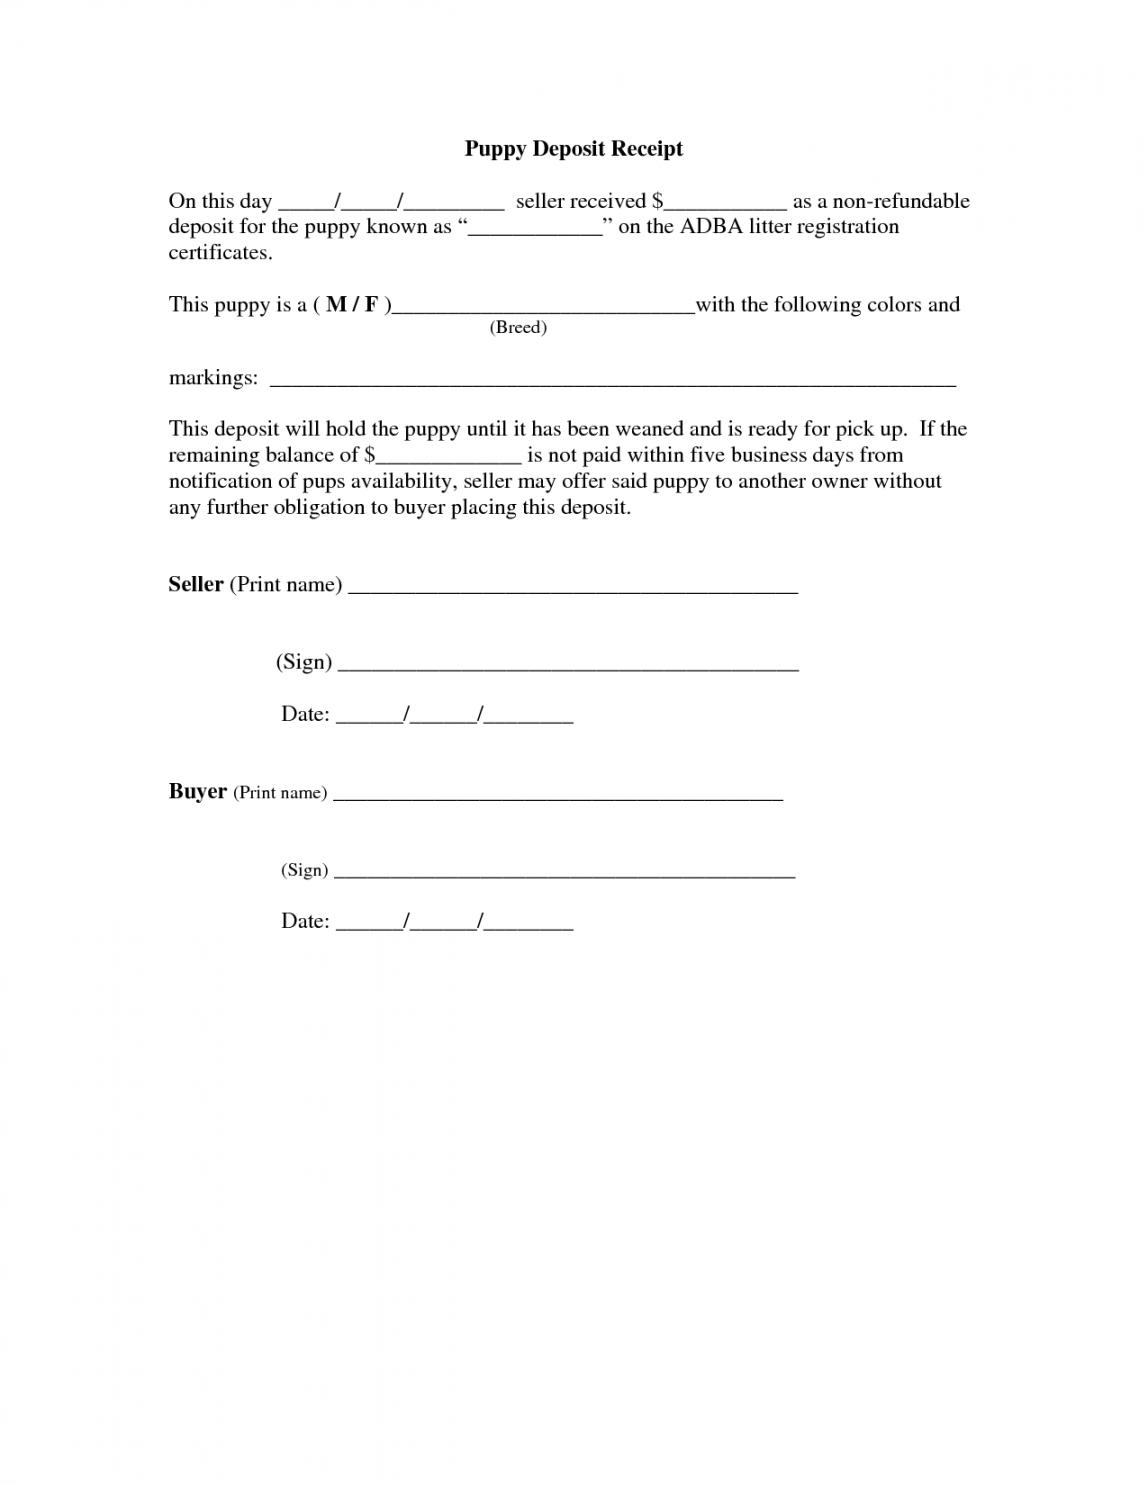 printable of car deposit agreement template  car sale deposit receipt puppy deposit contract template doc